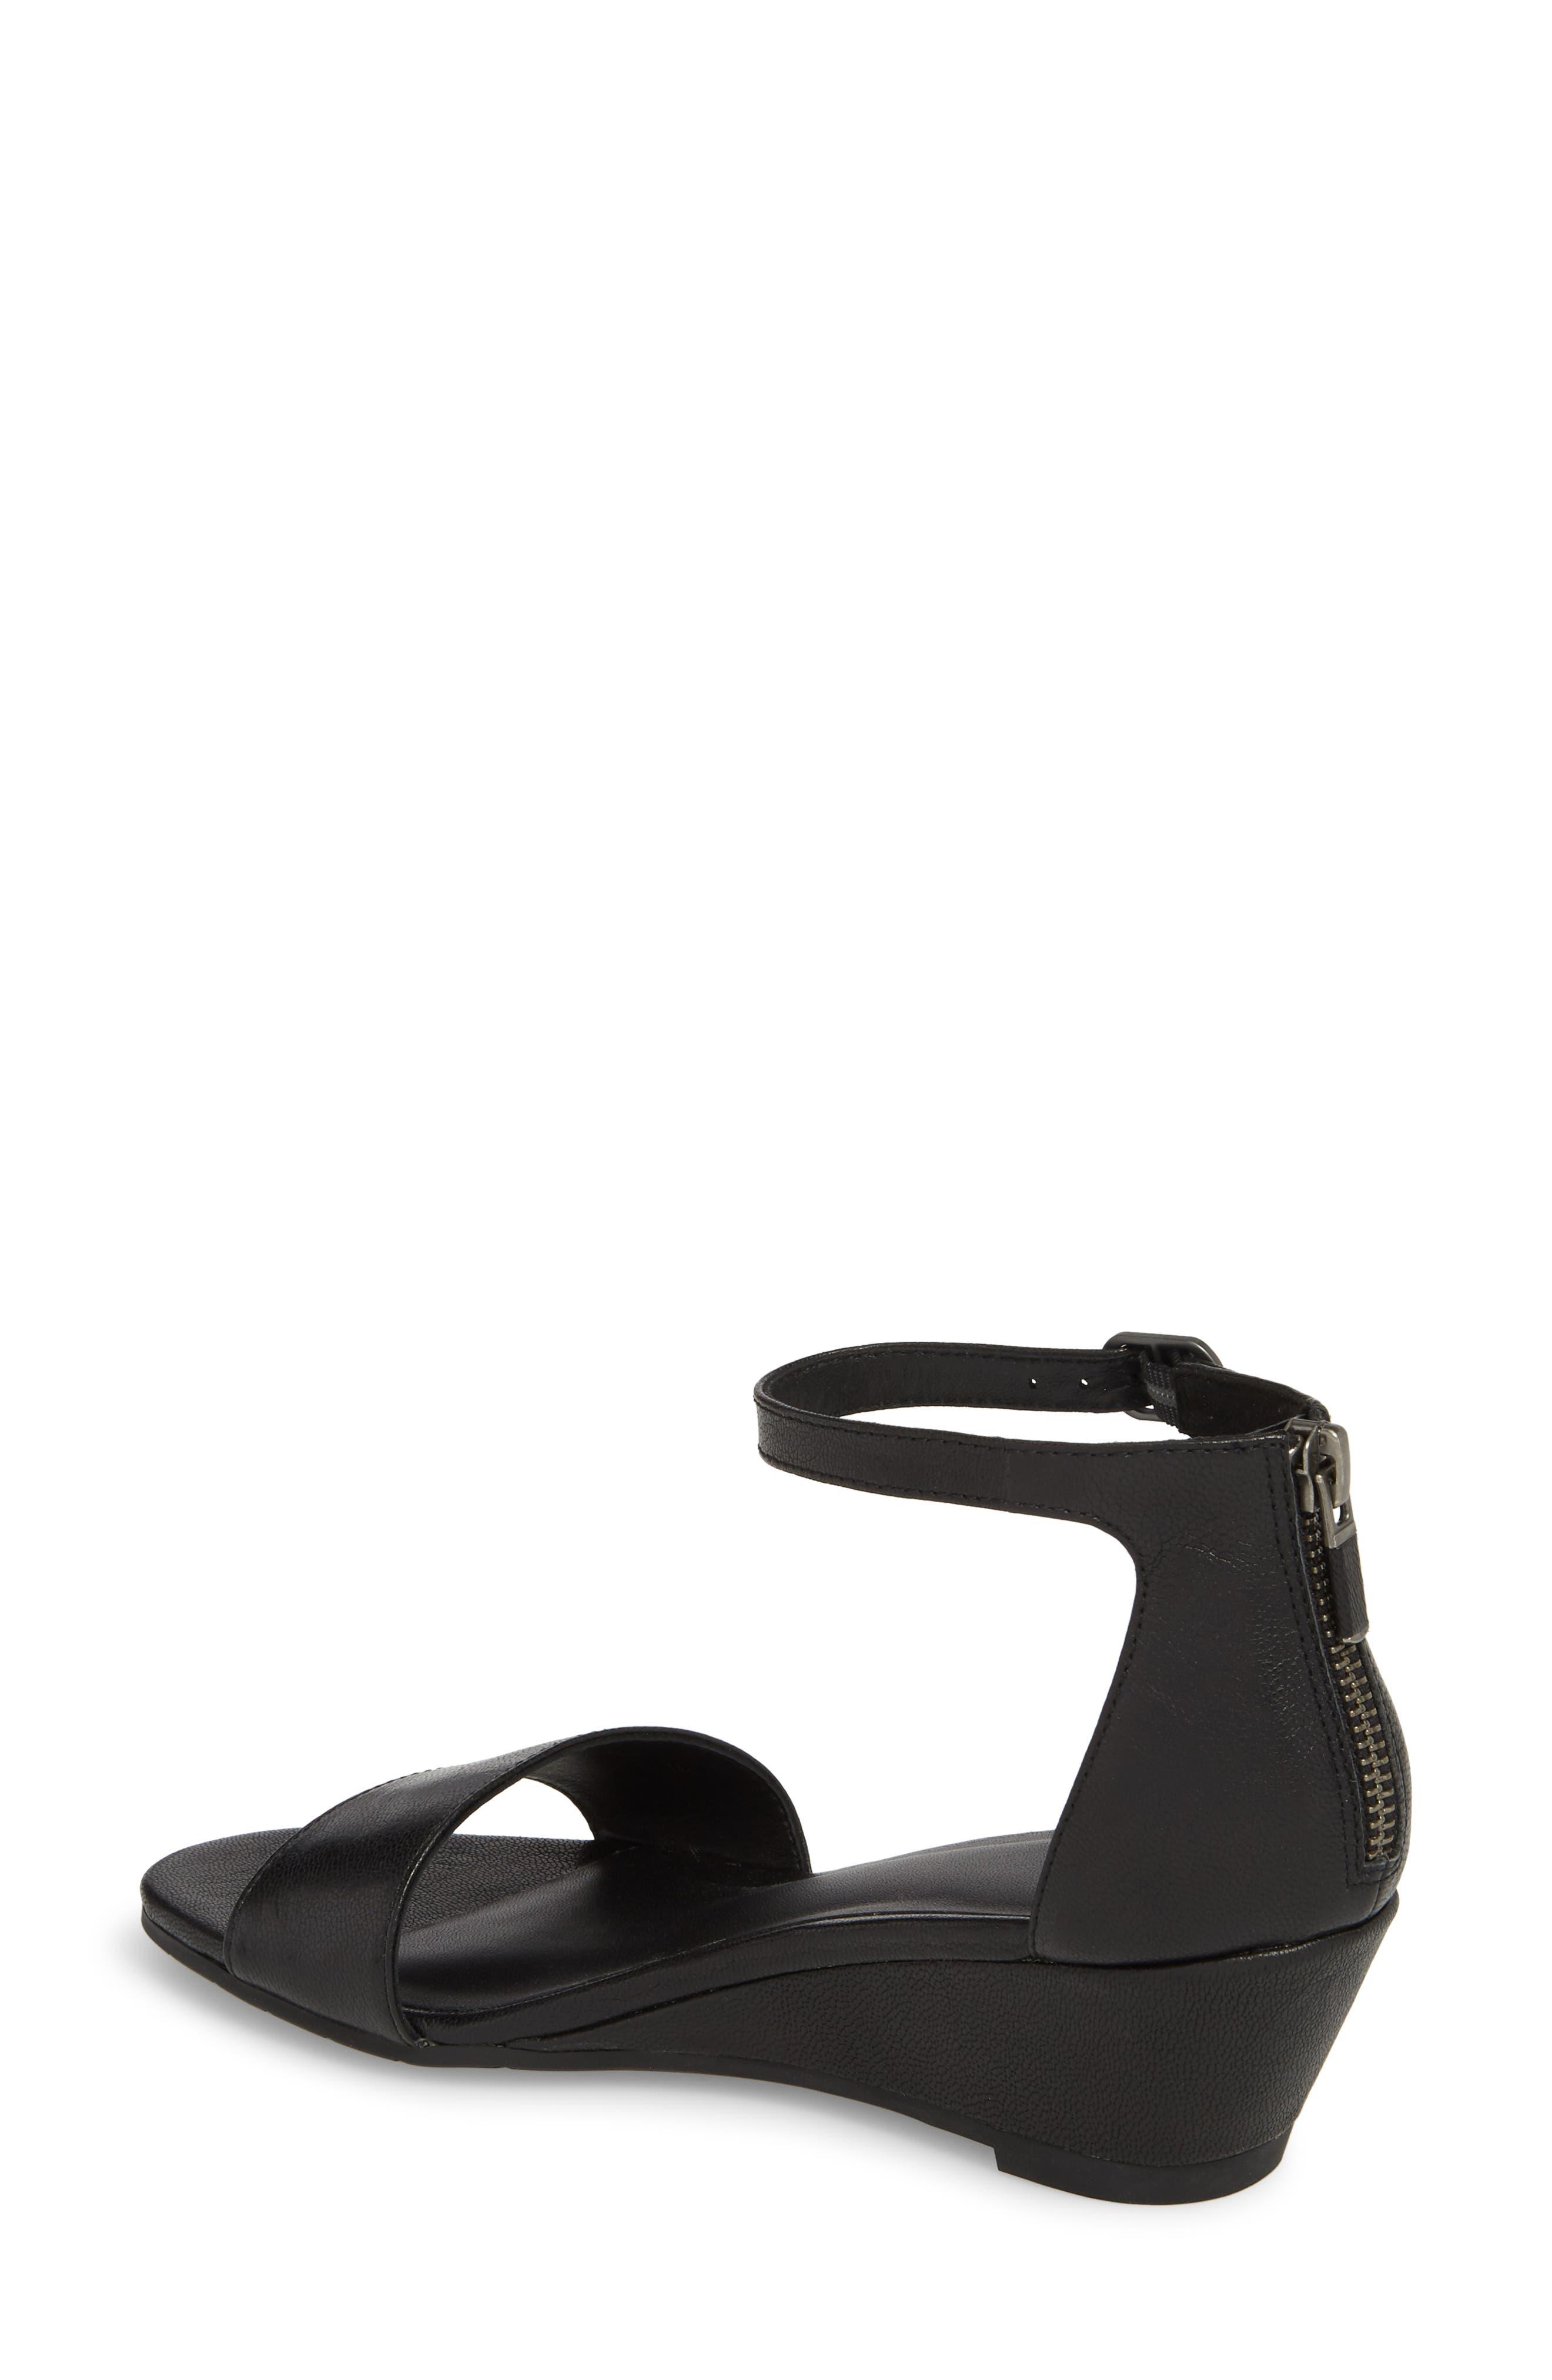 Mara Ankle Strap Wedge Sandal,                             Alternate thumbnail 2, color,                             001